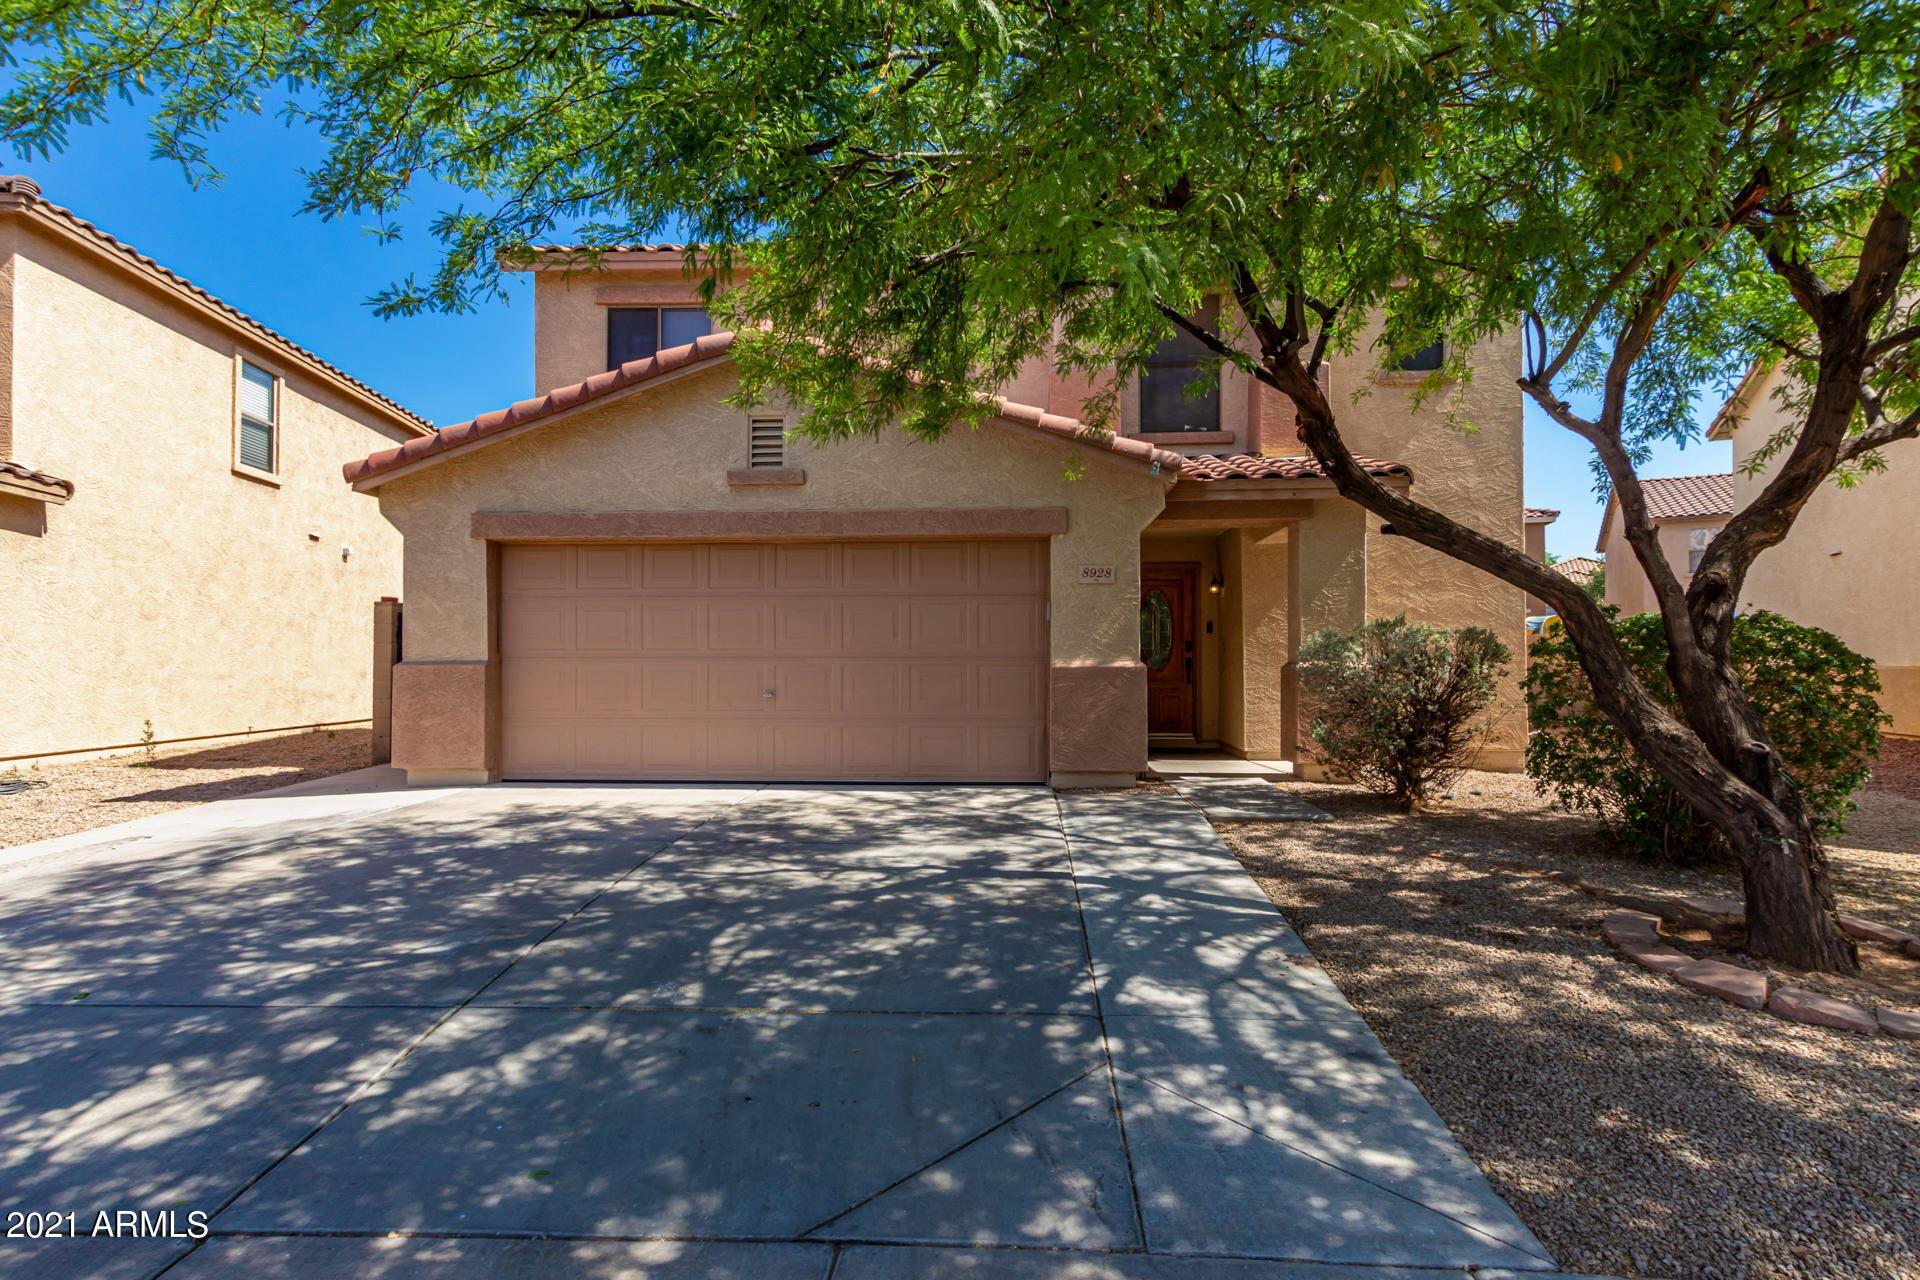 8928 E PAMPA Avenue, Mesa, AZ 85212 - MLS#: 6237742